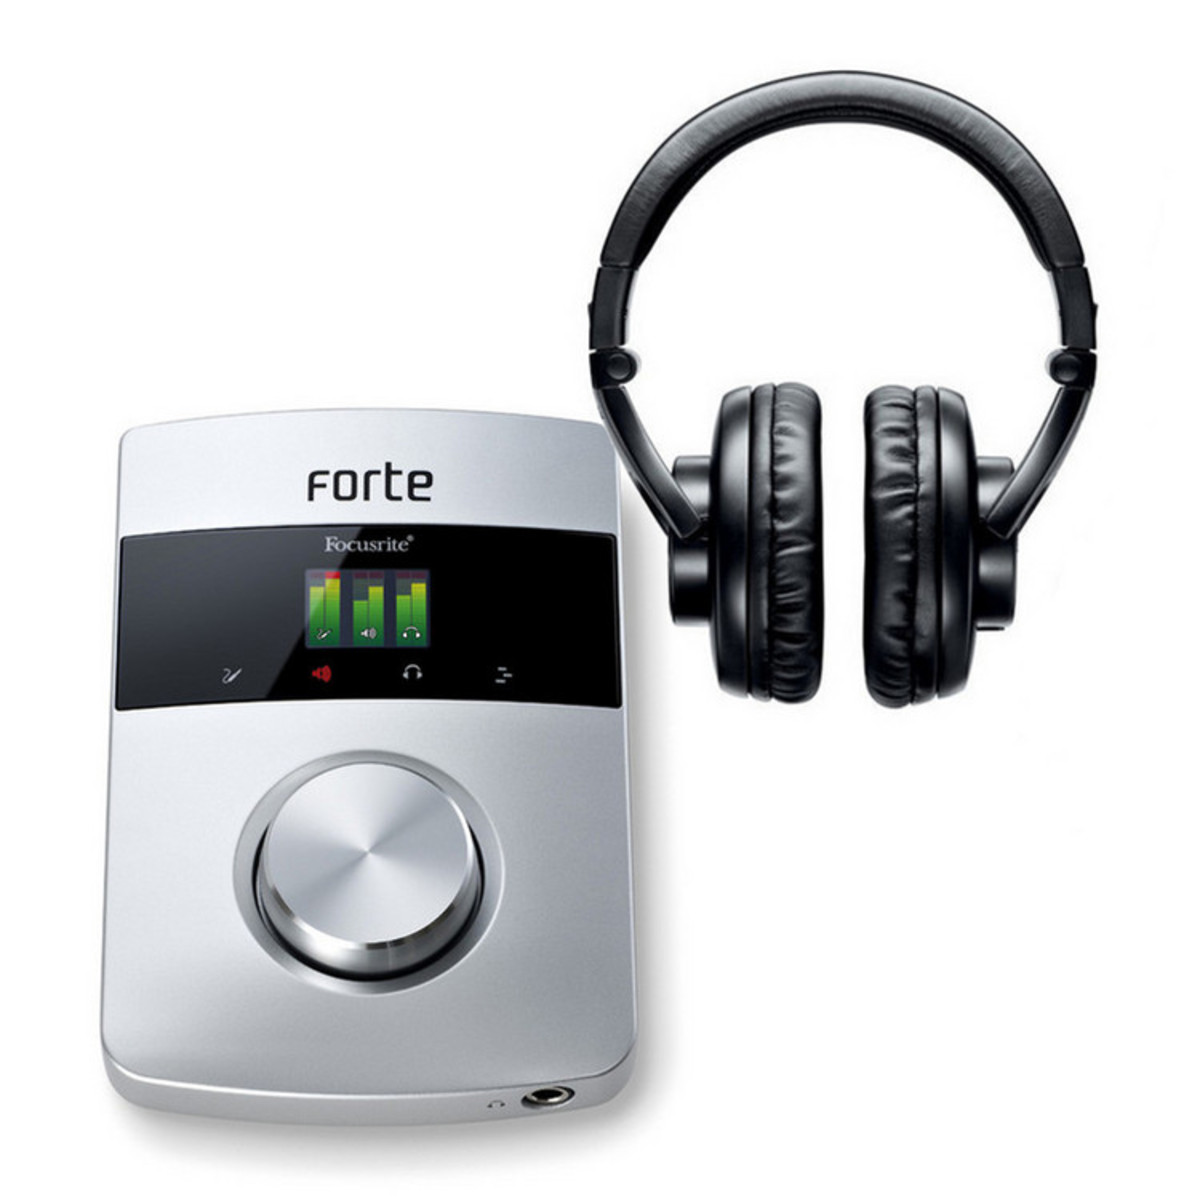 focusrite forte usb interface audio casque shure srh440. Black Bedroom Furniture Sets. Home Design Ideas